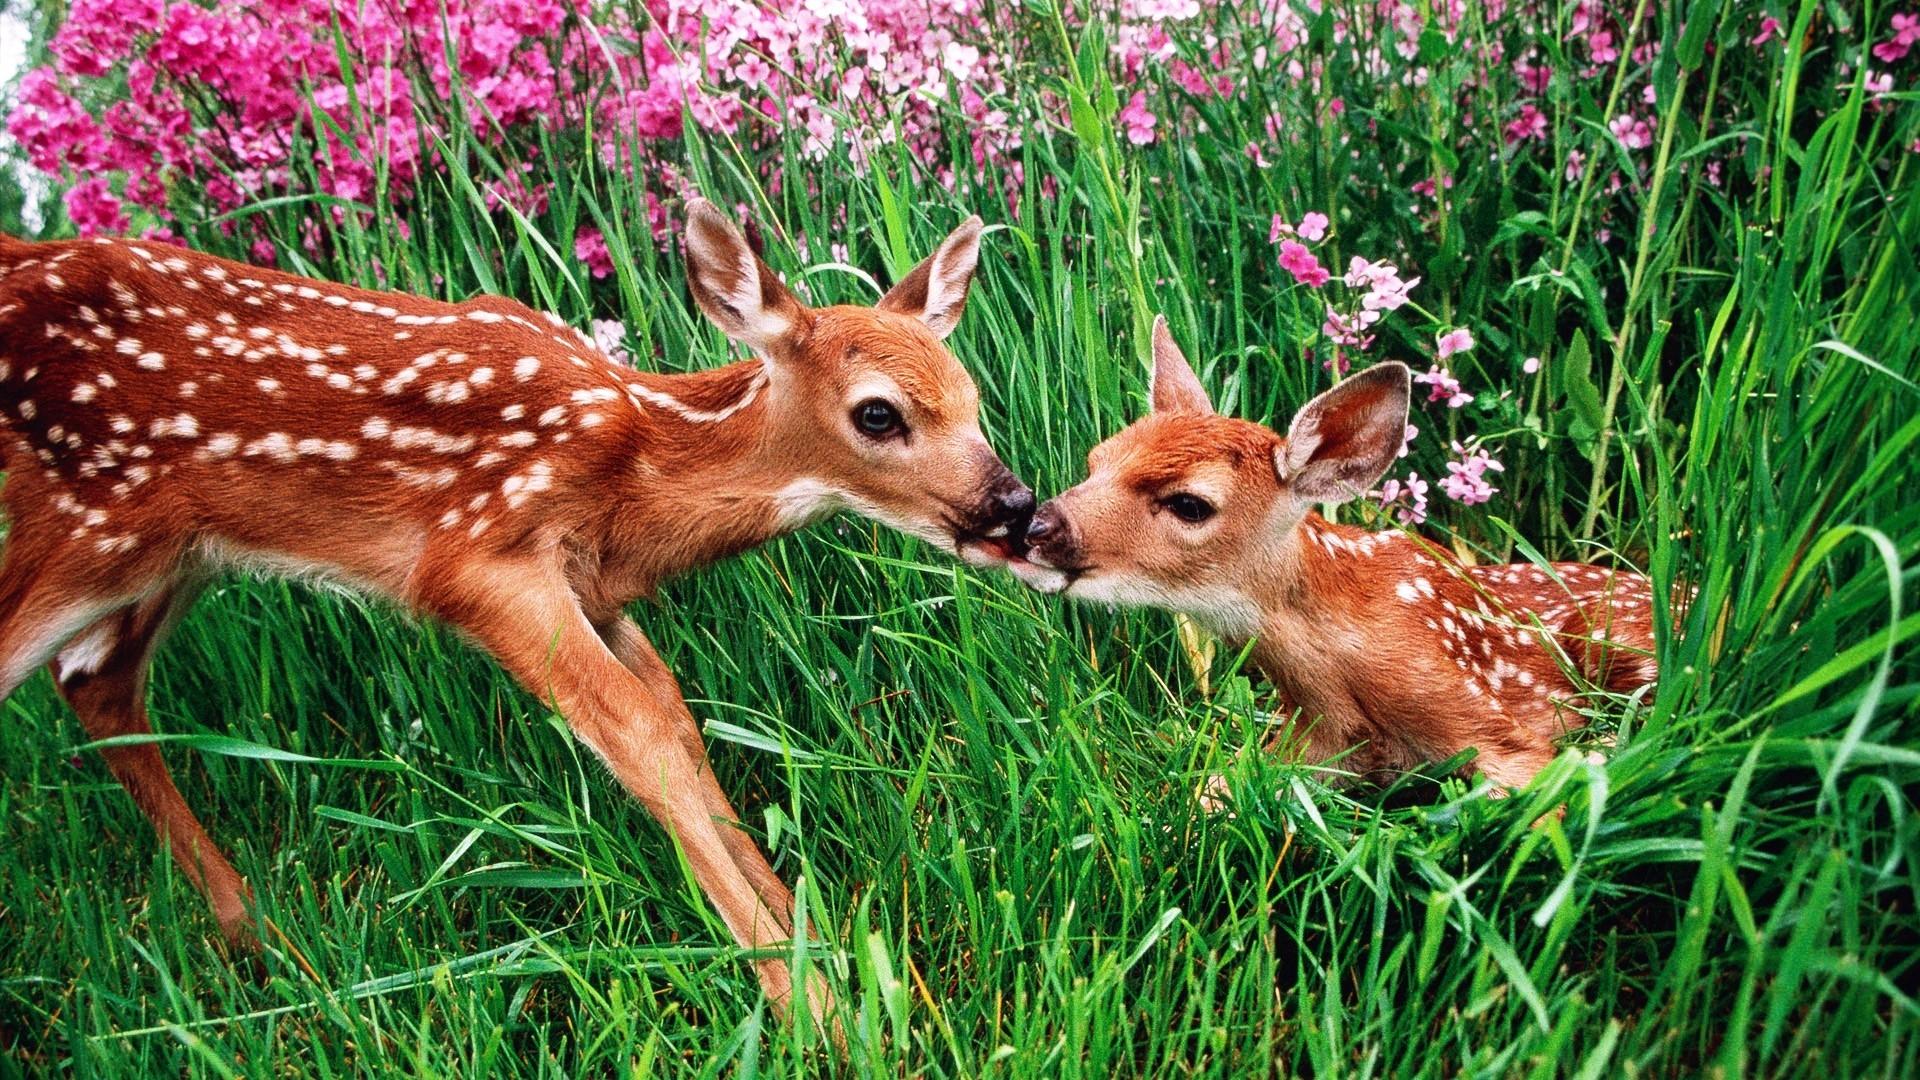 spring animals desktop wallpaper (51+ images)